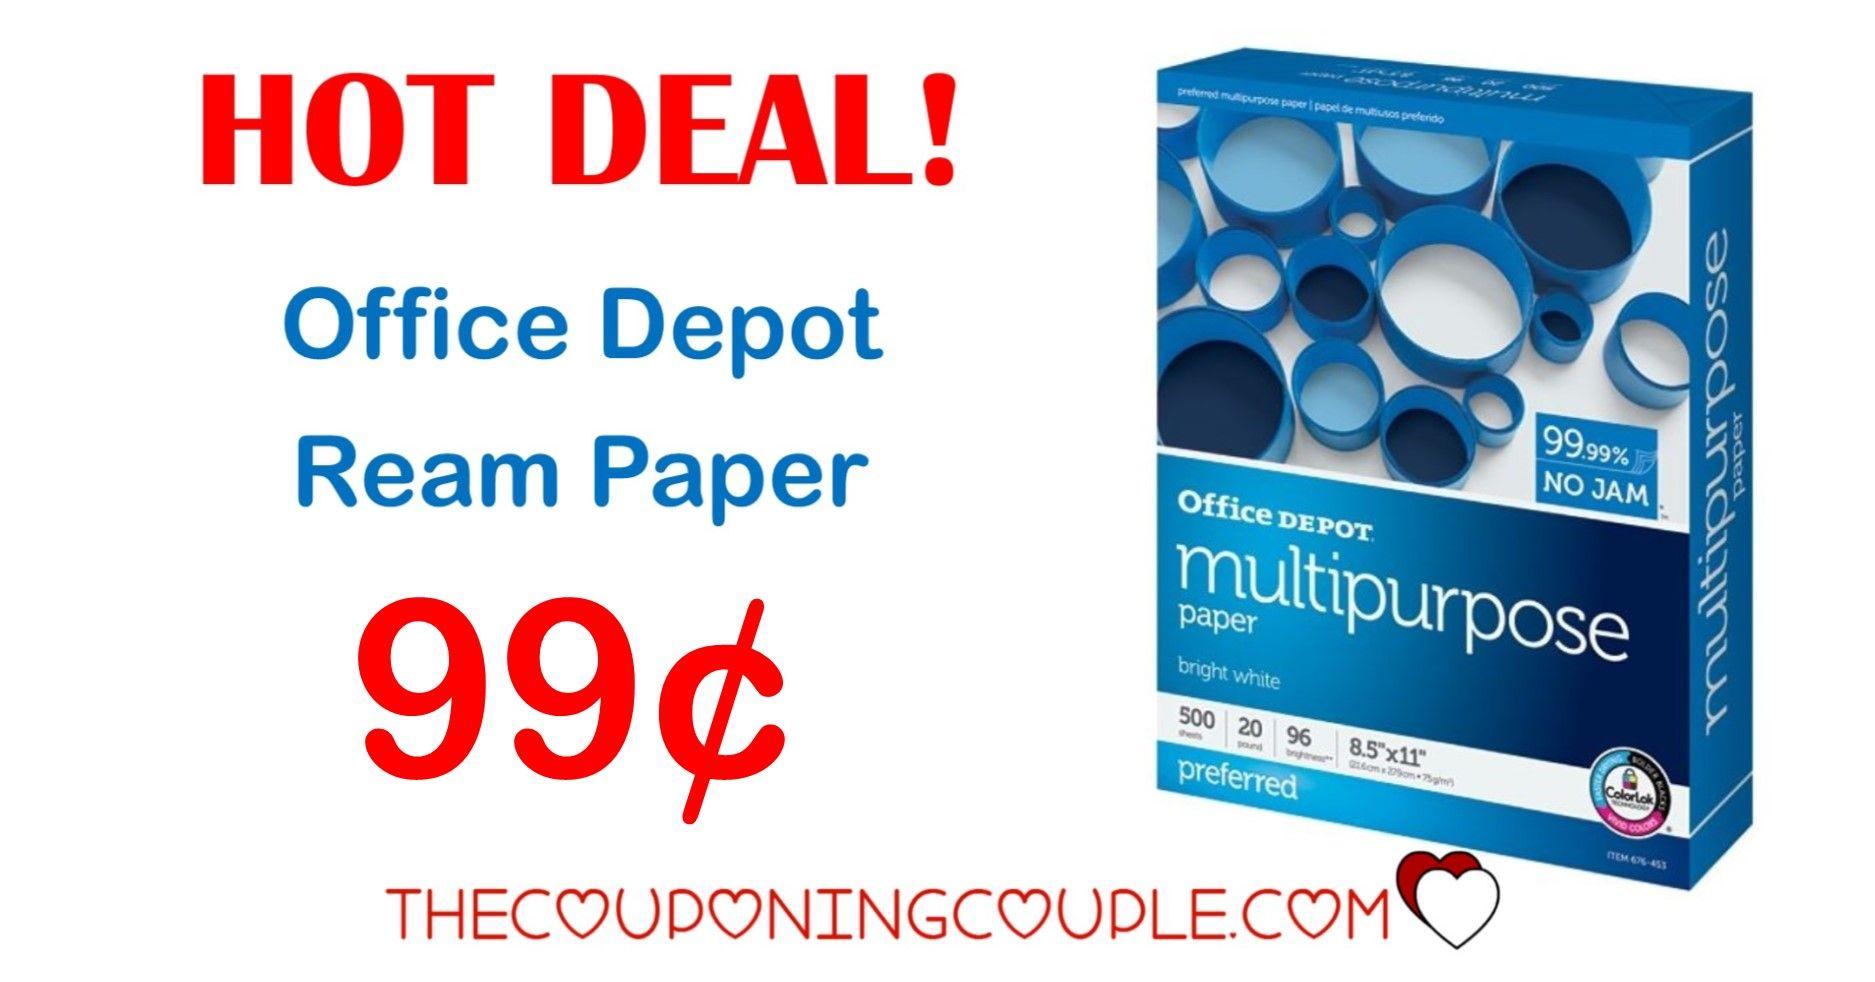 HOT DEAL! Office Depot Ream Paper Only 0.99 per Ream